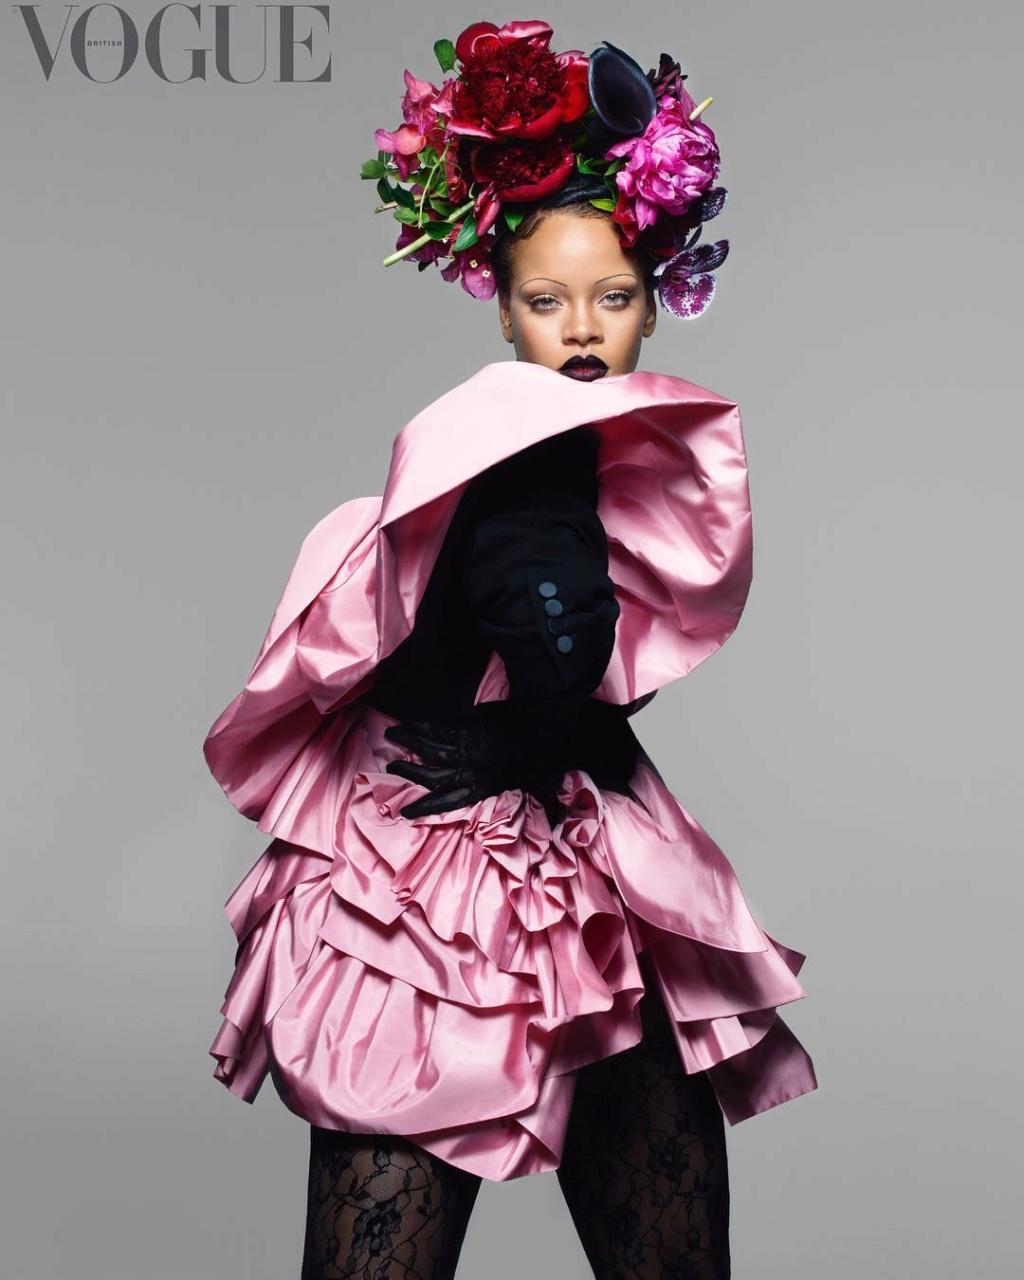 Rihanna >> preparando nuevo álbum - Página 11 Img_2047